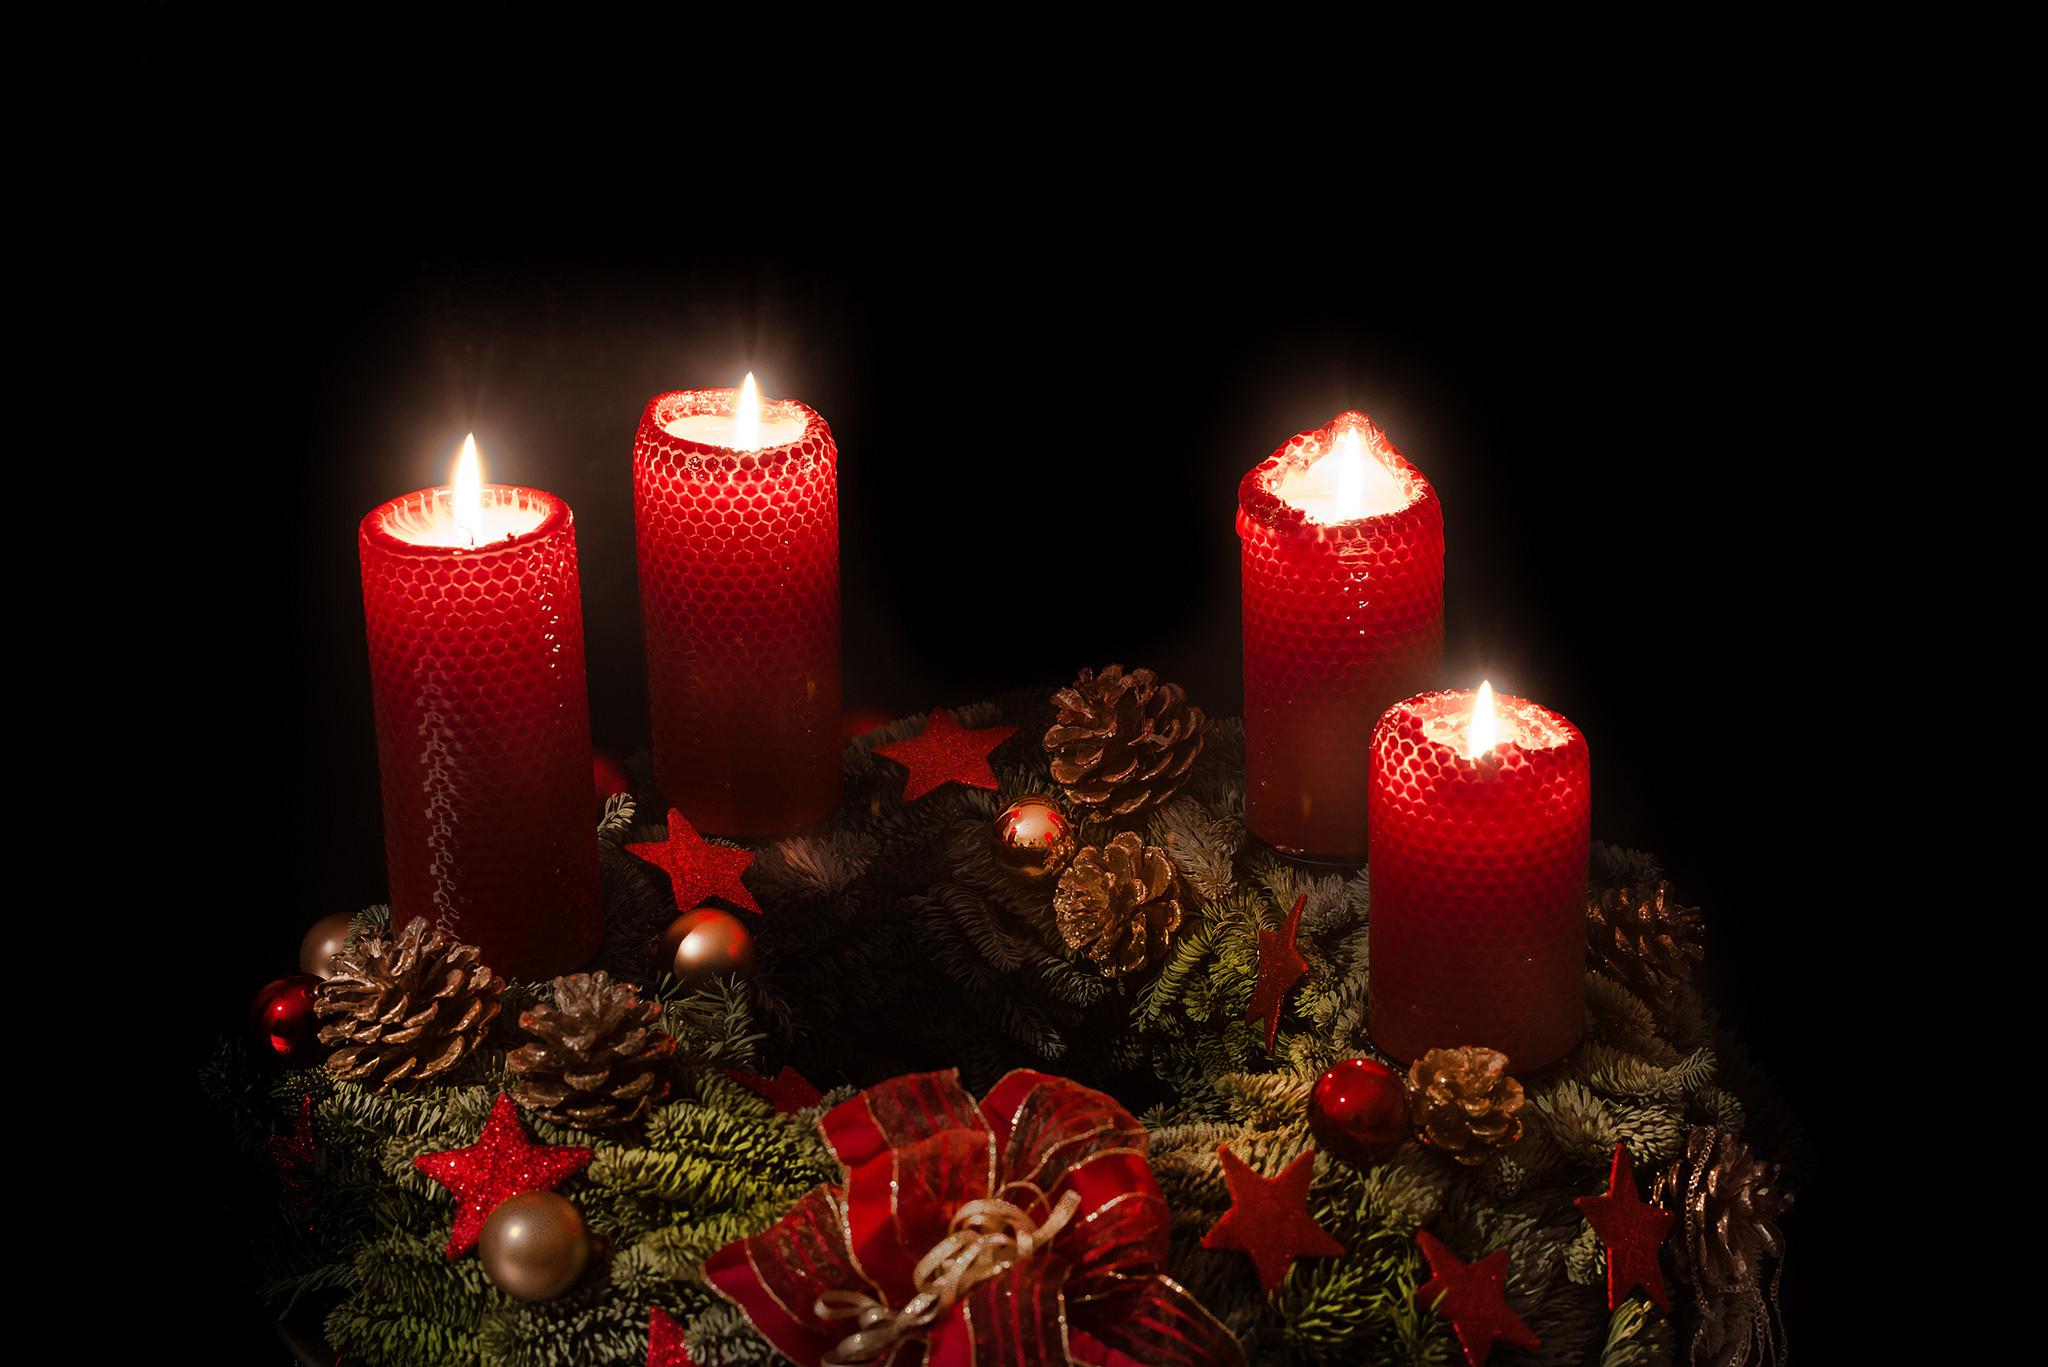 обои свечи, пламя, украшения, шишки картинки фото